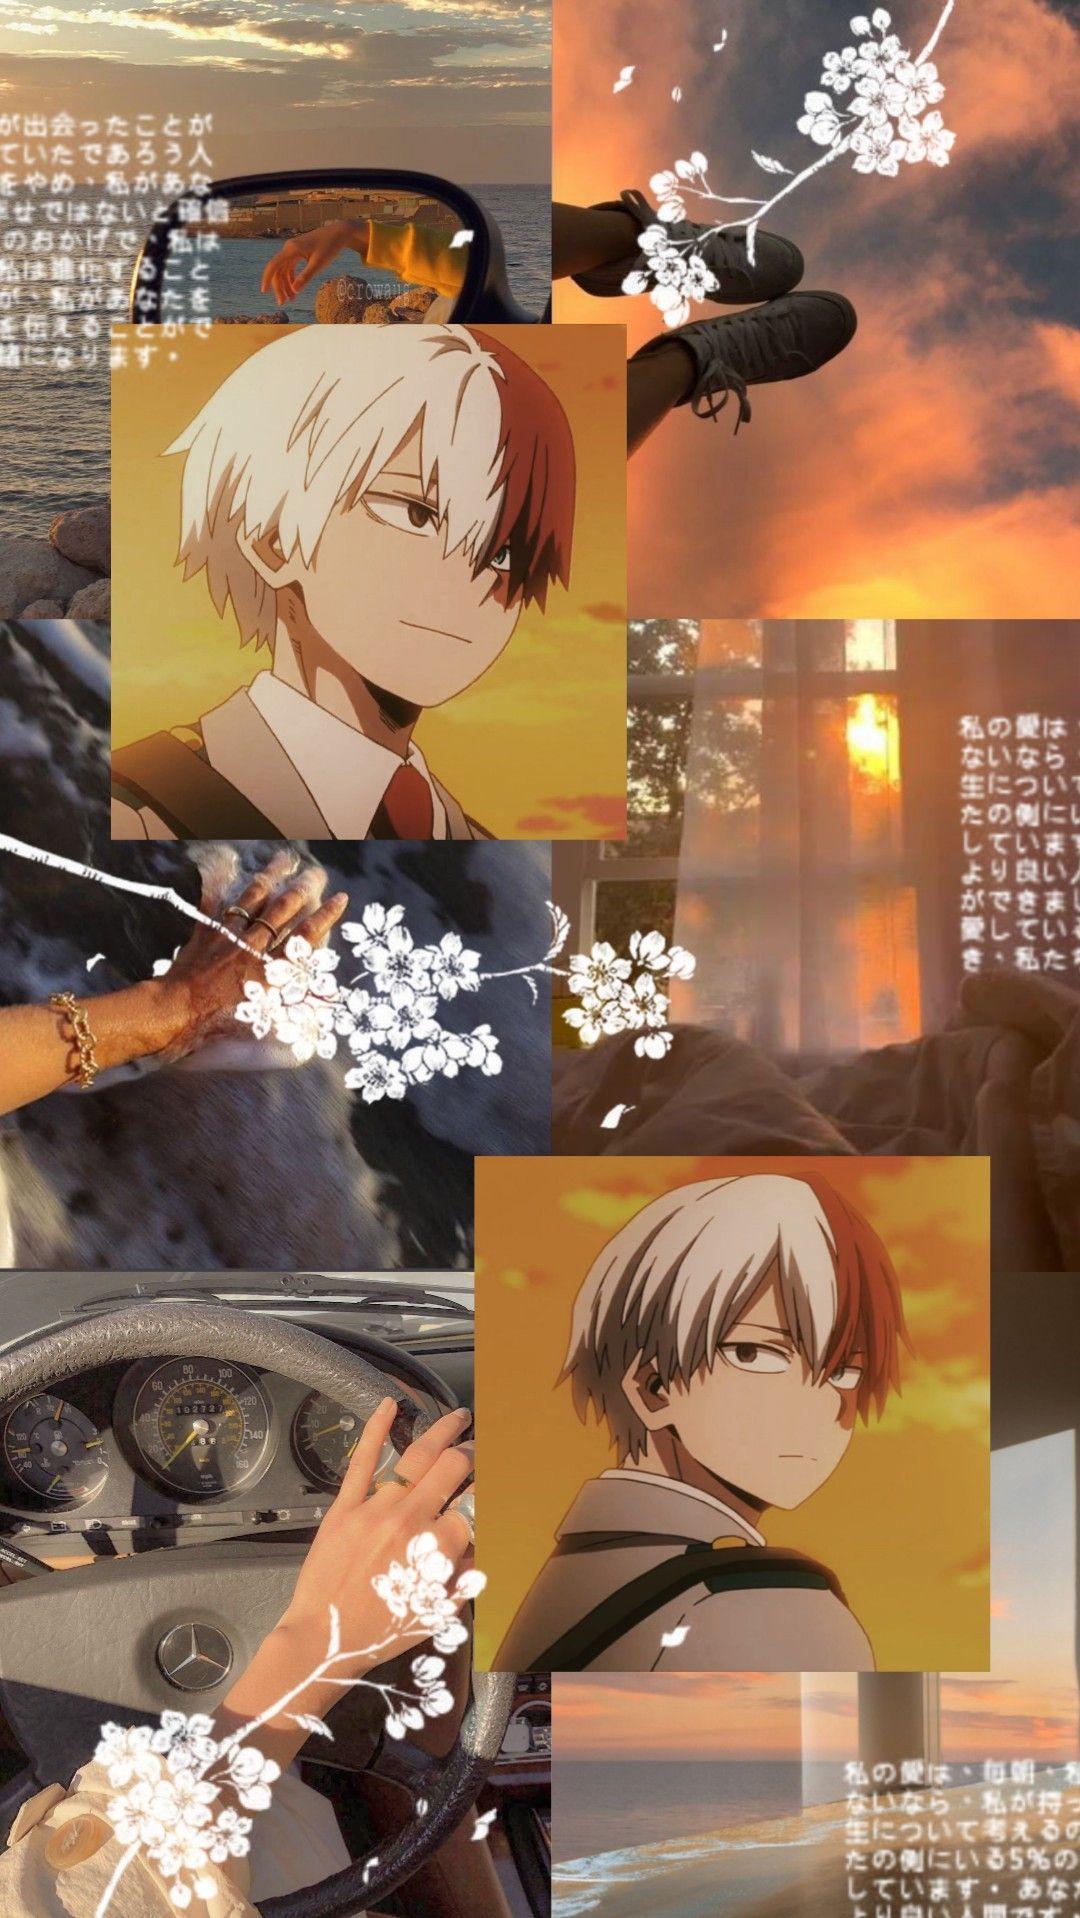 Shouto Todoroki I Finished Like 2 Seconds Ago Bokunoheroacademia Cute Anime Guys Anime Wallpaper Cute Wallpapers